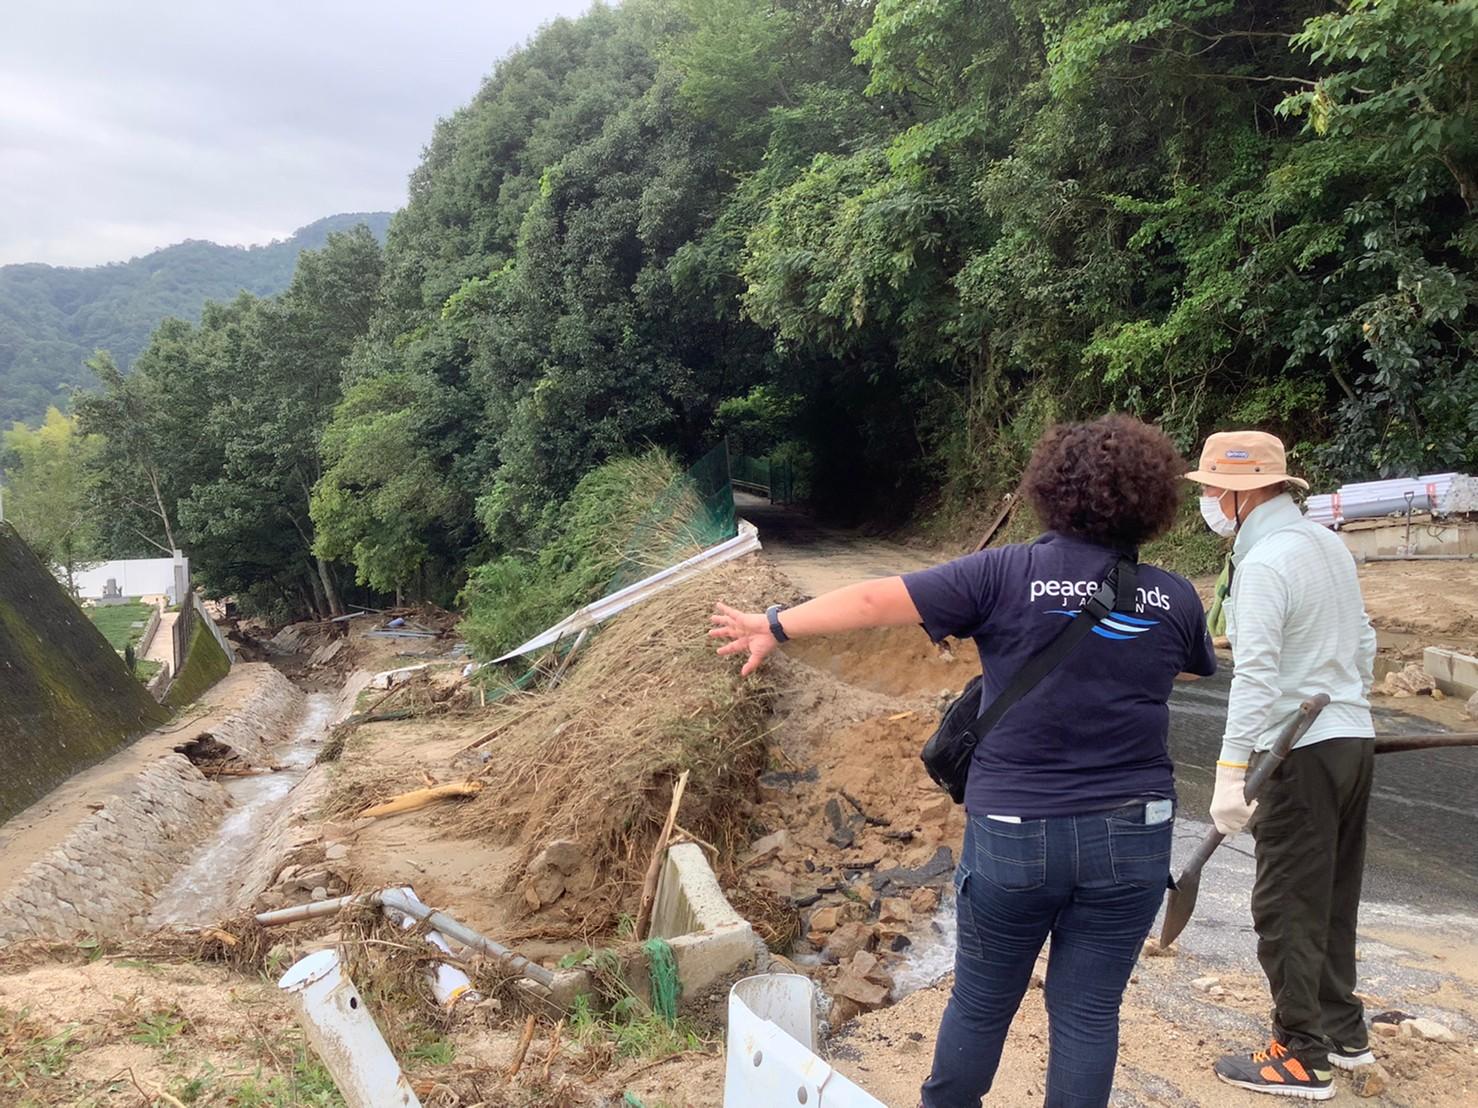 【令和3年8月豪雨】8/21・24 広島県内被災地への調査・物資支援を実施